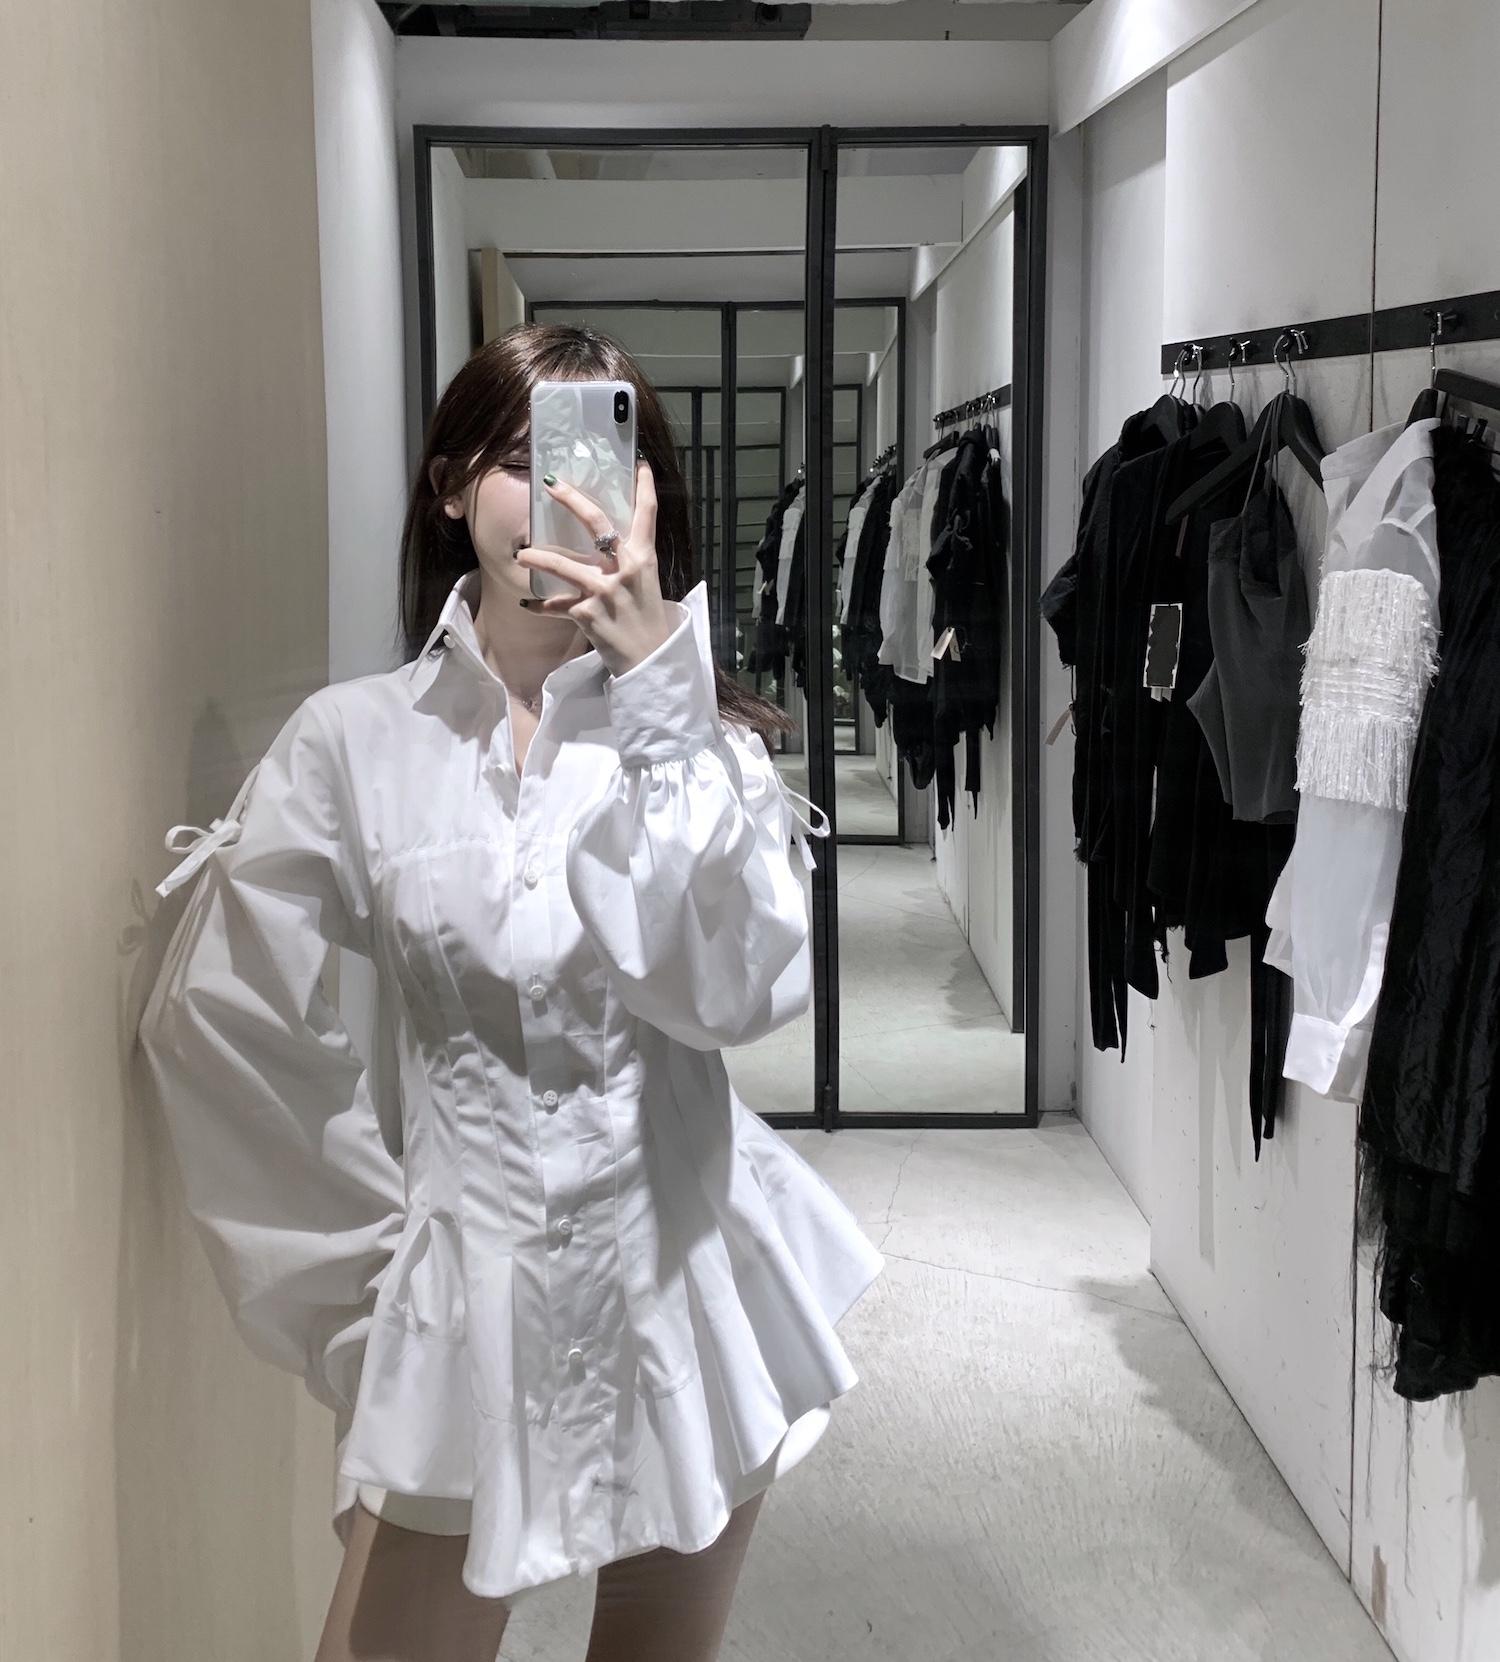 CHIYCOU 小众暗黑风少女 宫廷收腰蝴蝶结灯笼袖白色立体裁剪衬衫269.00元包邮